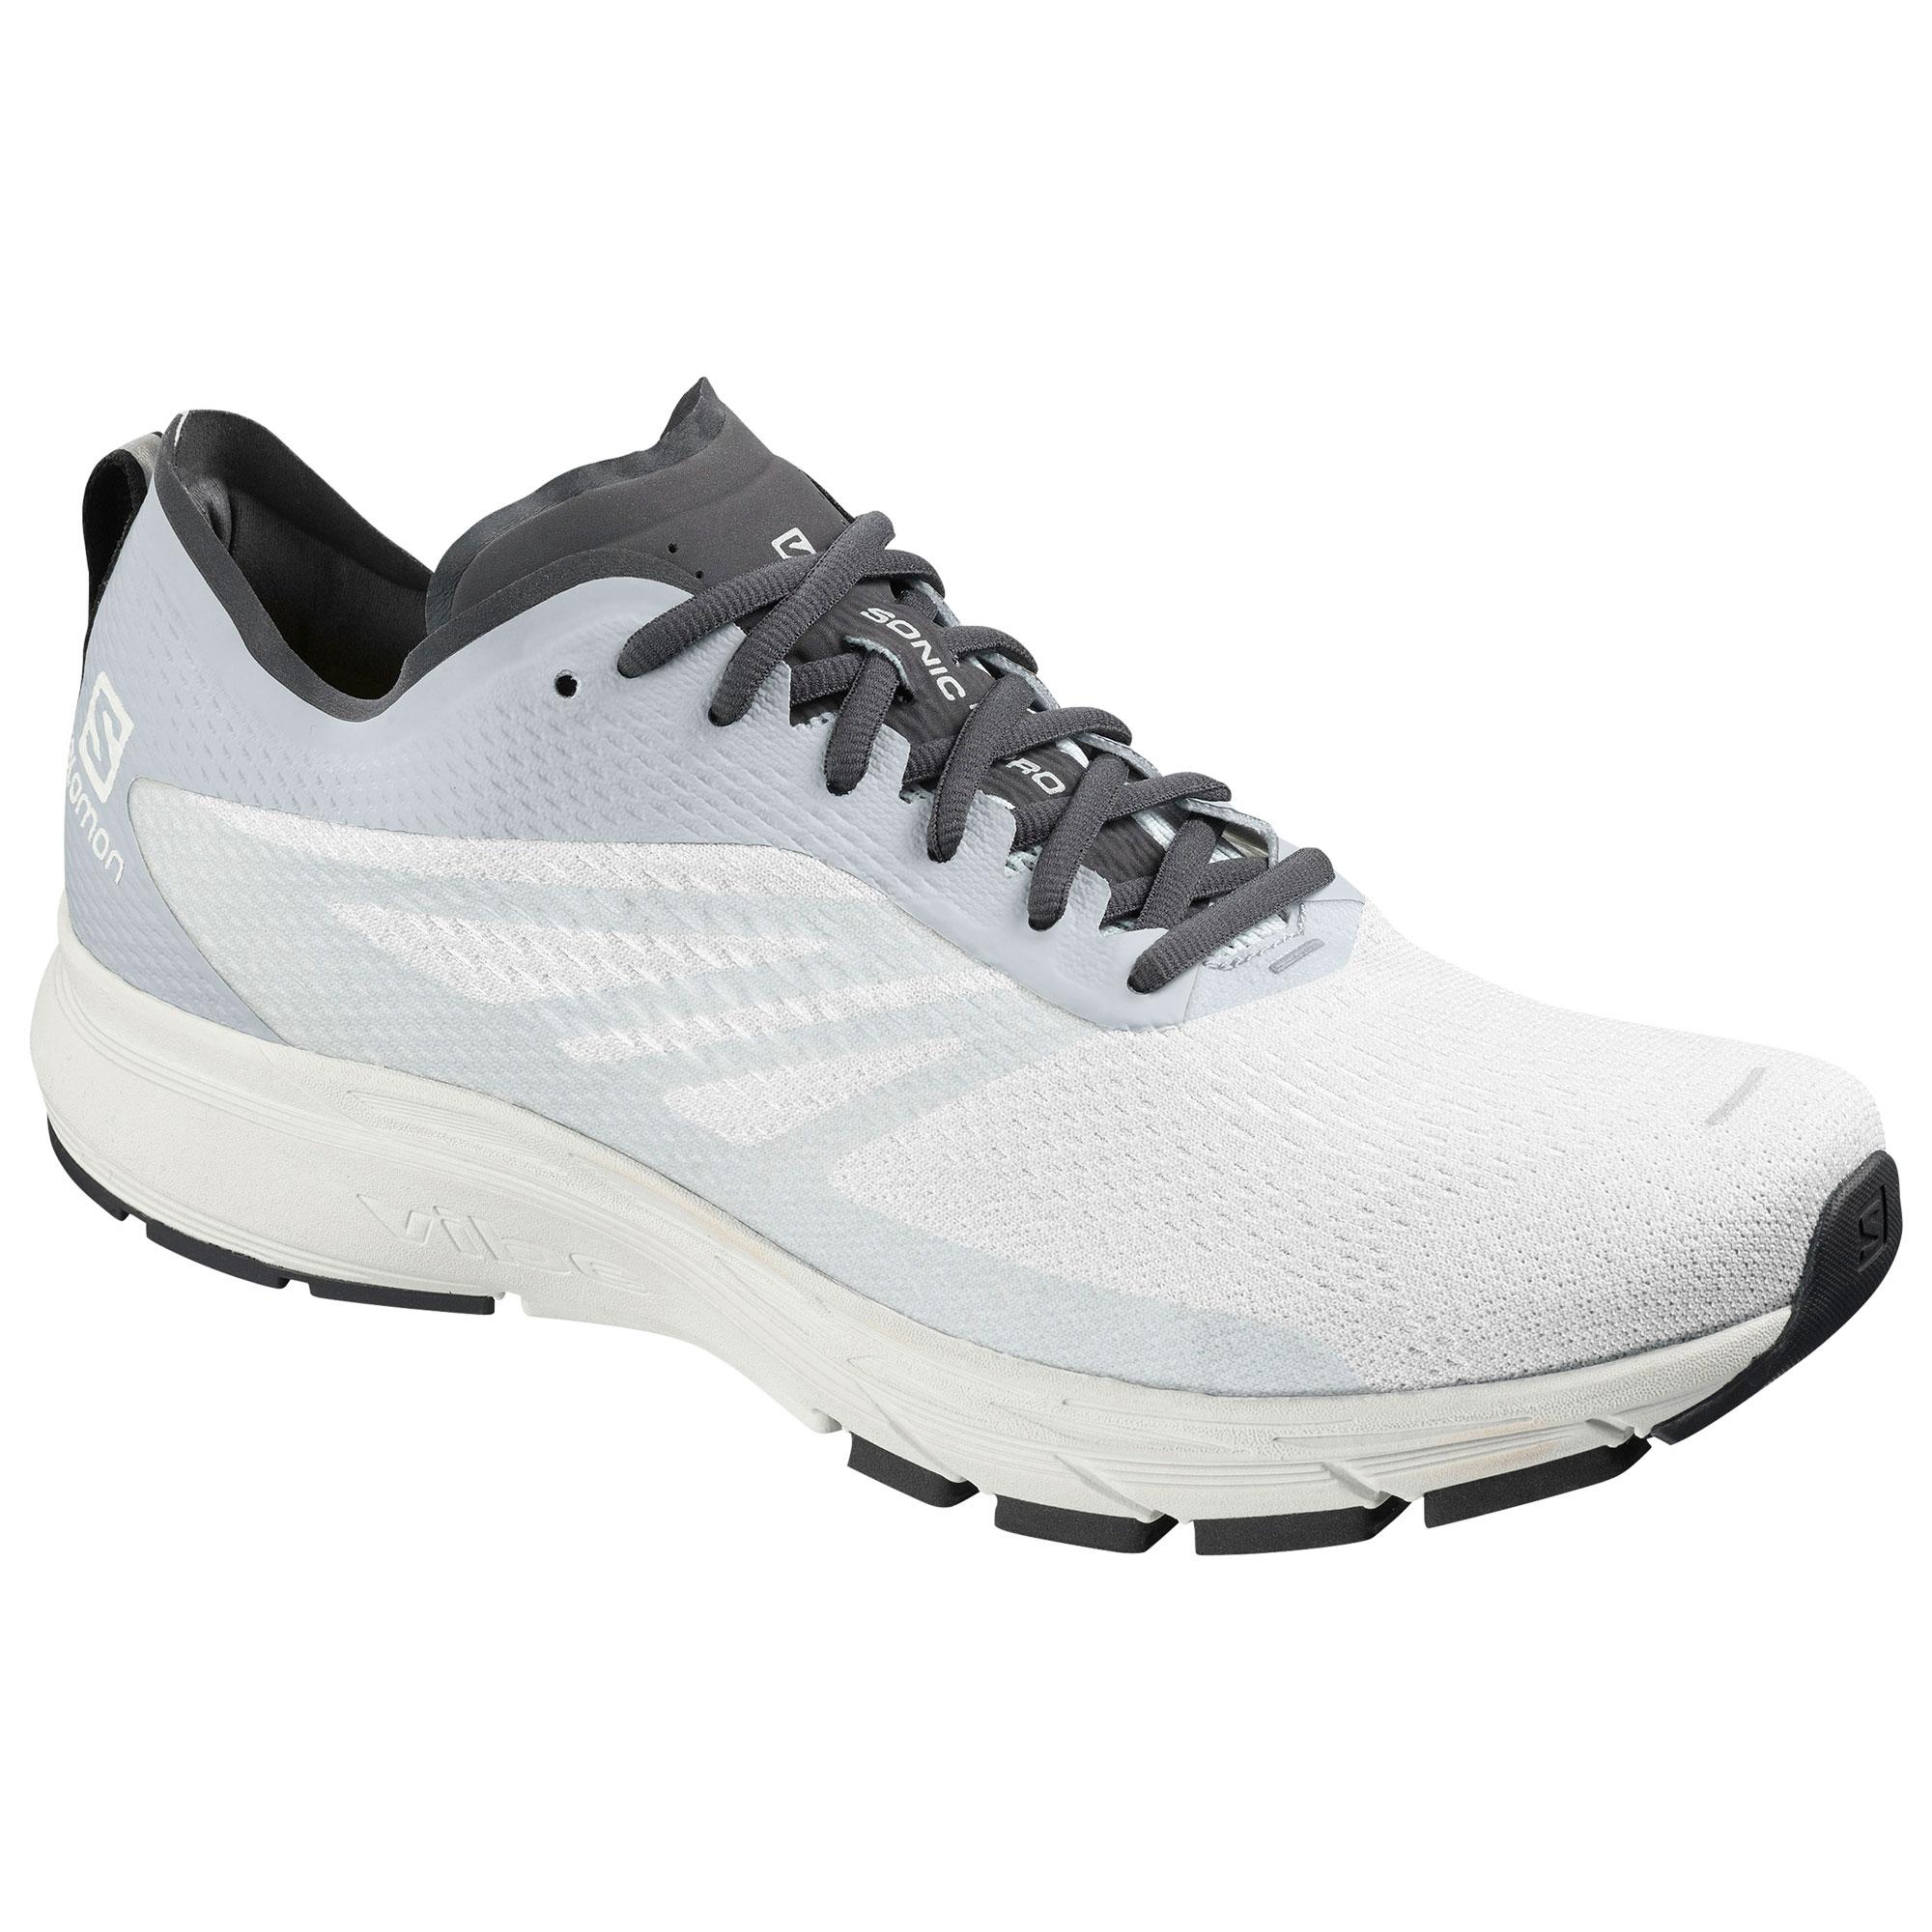 397a7a86d5d0 Salomon Sonic RA Pro 2 Road Running Shoe - Mens w  Free S H — 7 models